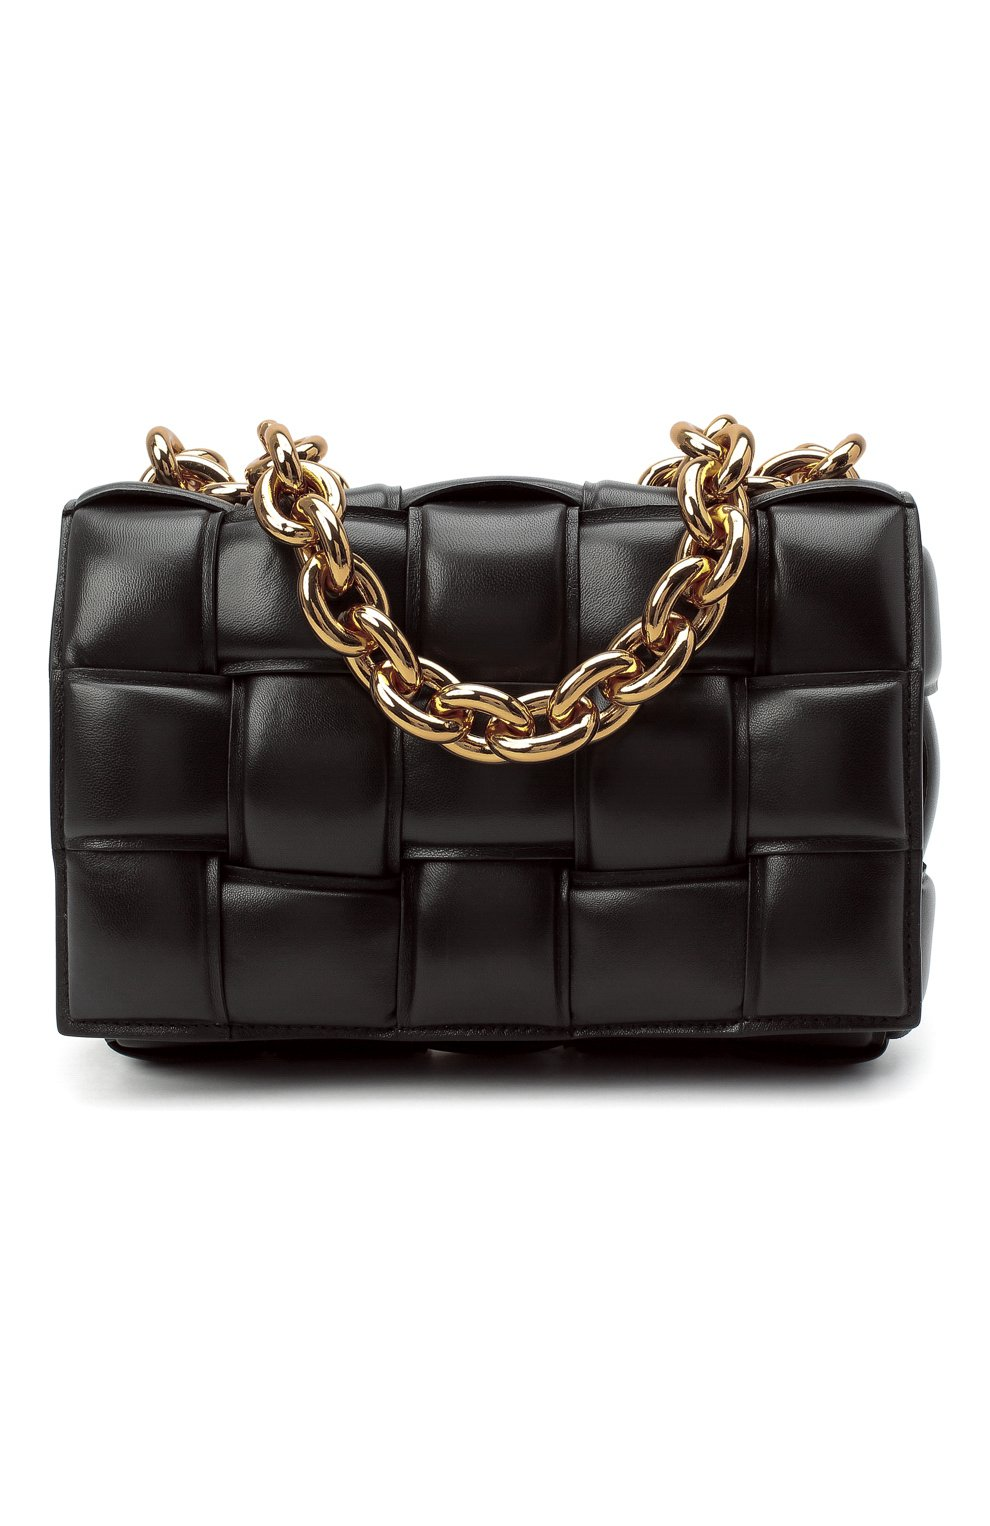 Женская сумка chain cassette BOTTEGA VENETA темно-коричневого цвета, арт. 631421/VBWZ0 | Фото 1